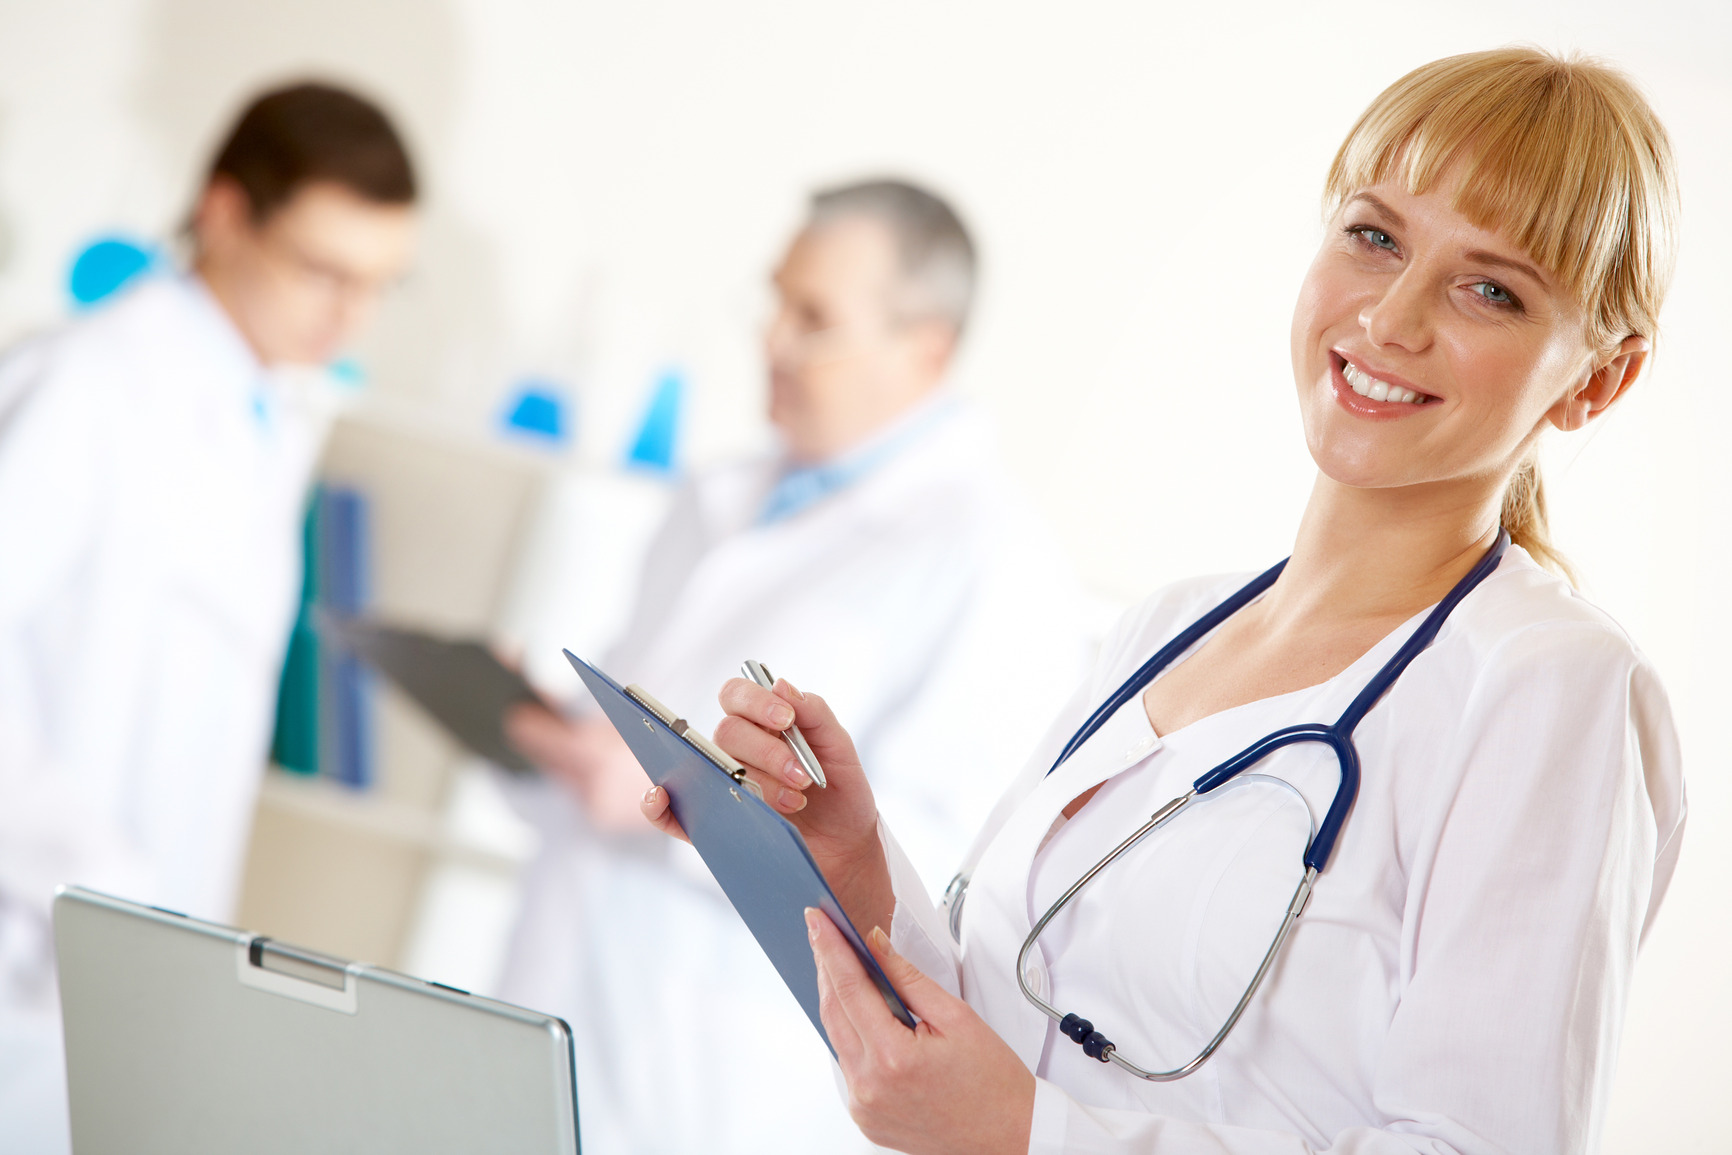 Primary Healthcare in Nursing Photo